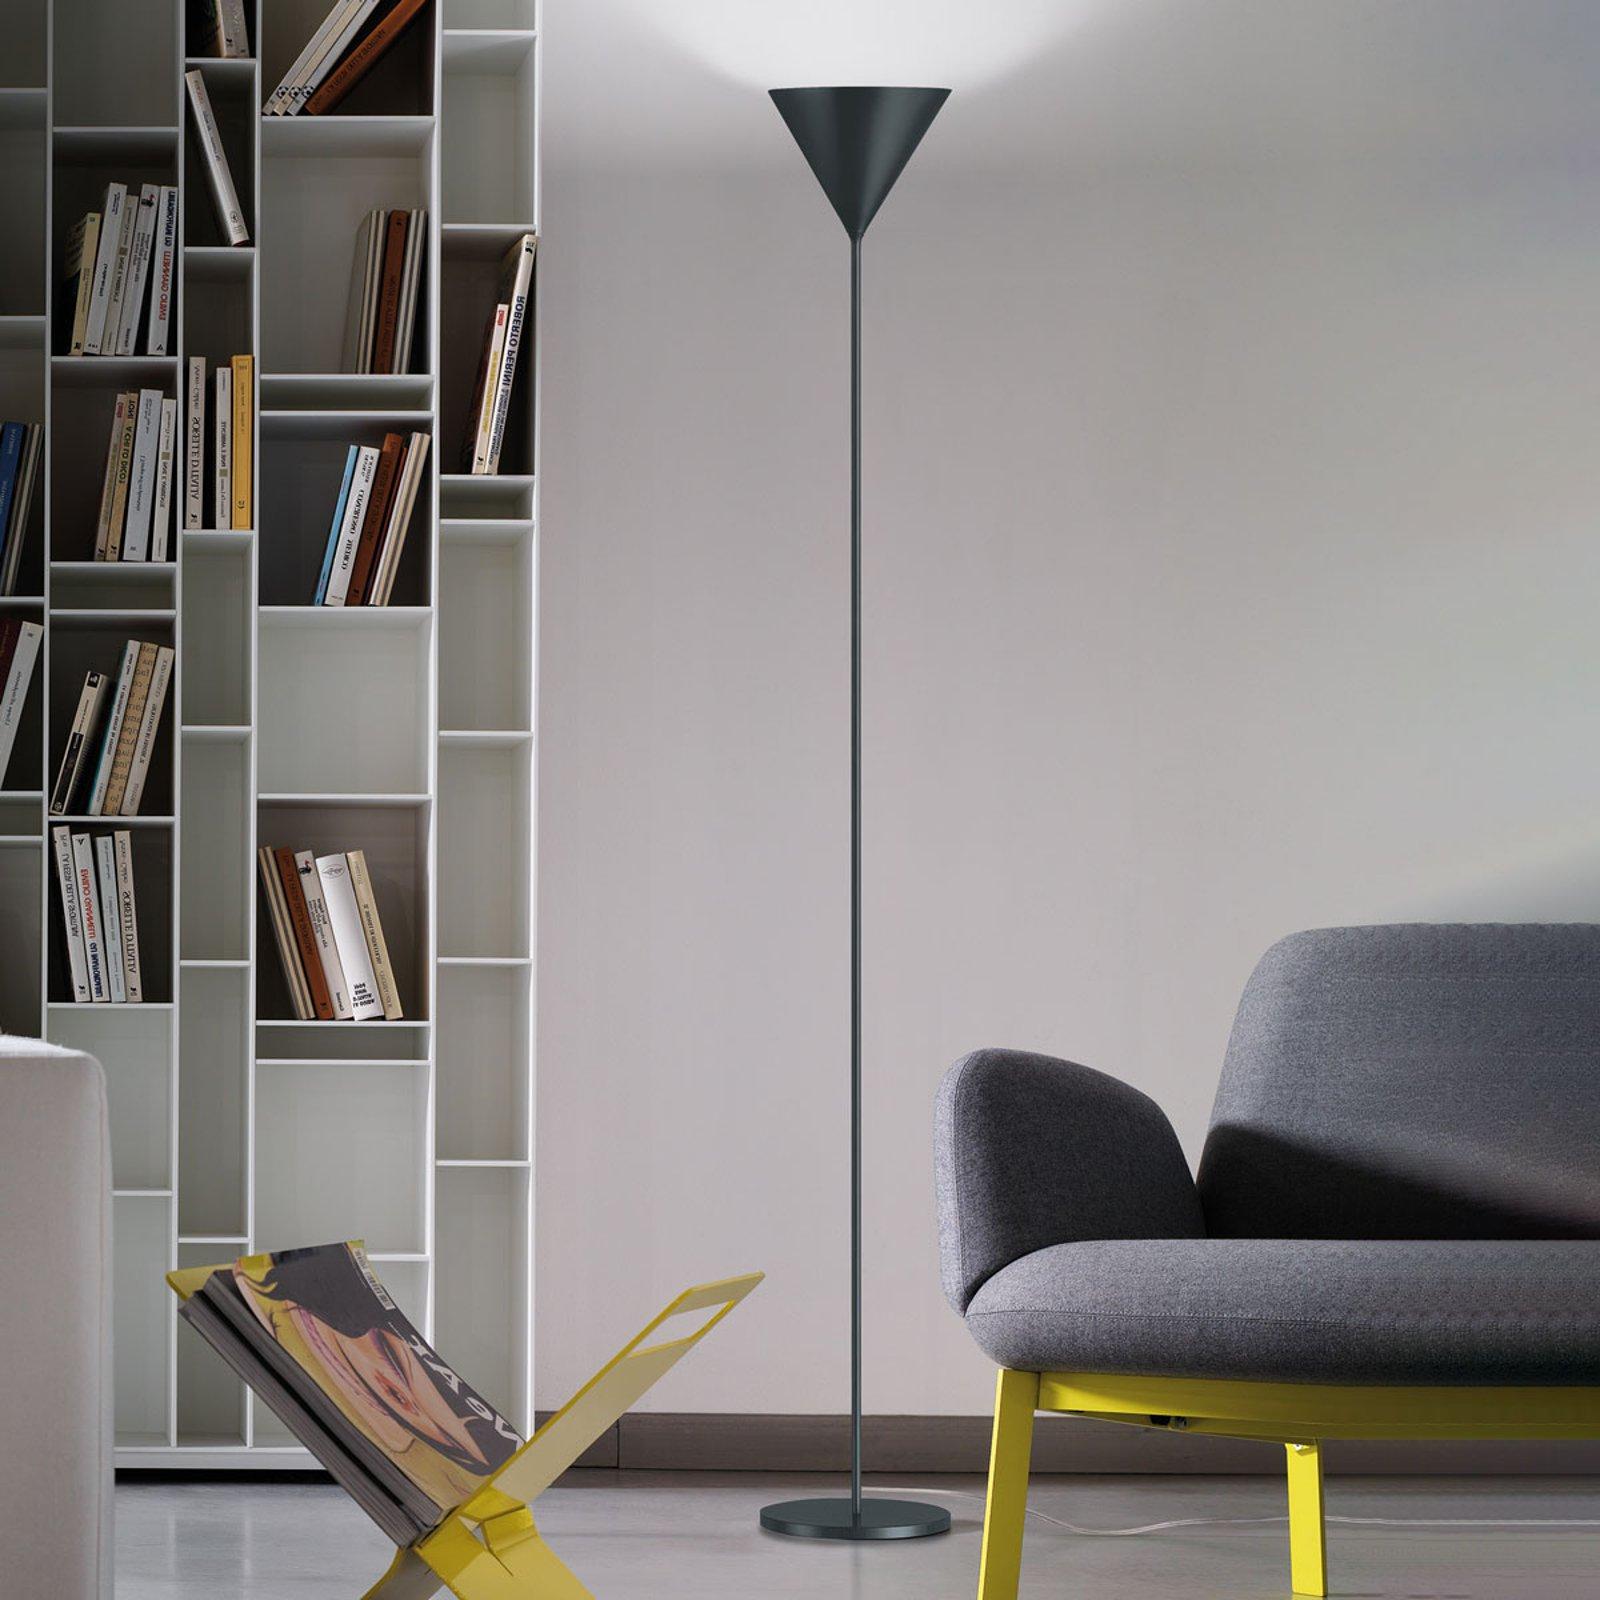 Modo Luce ABC Single gulvlampe blygrå